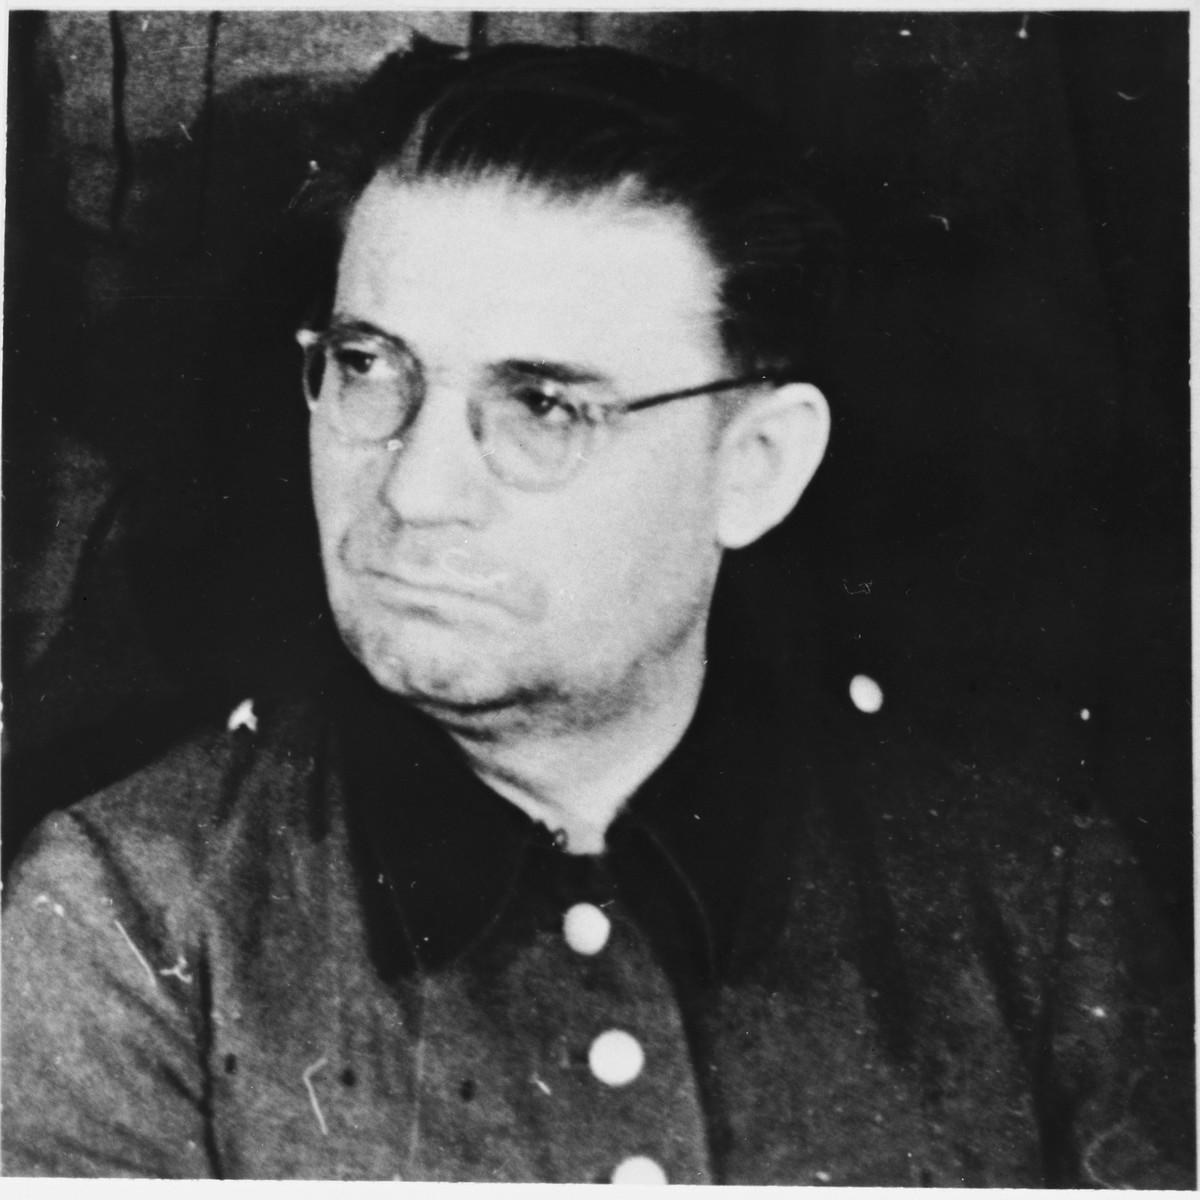 Defendant Kurt Eccarius at the Sachsenhausen concentration camp war crimes trial in Berlin.